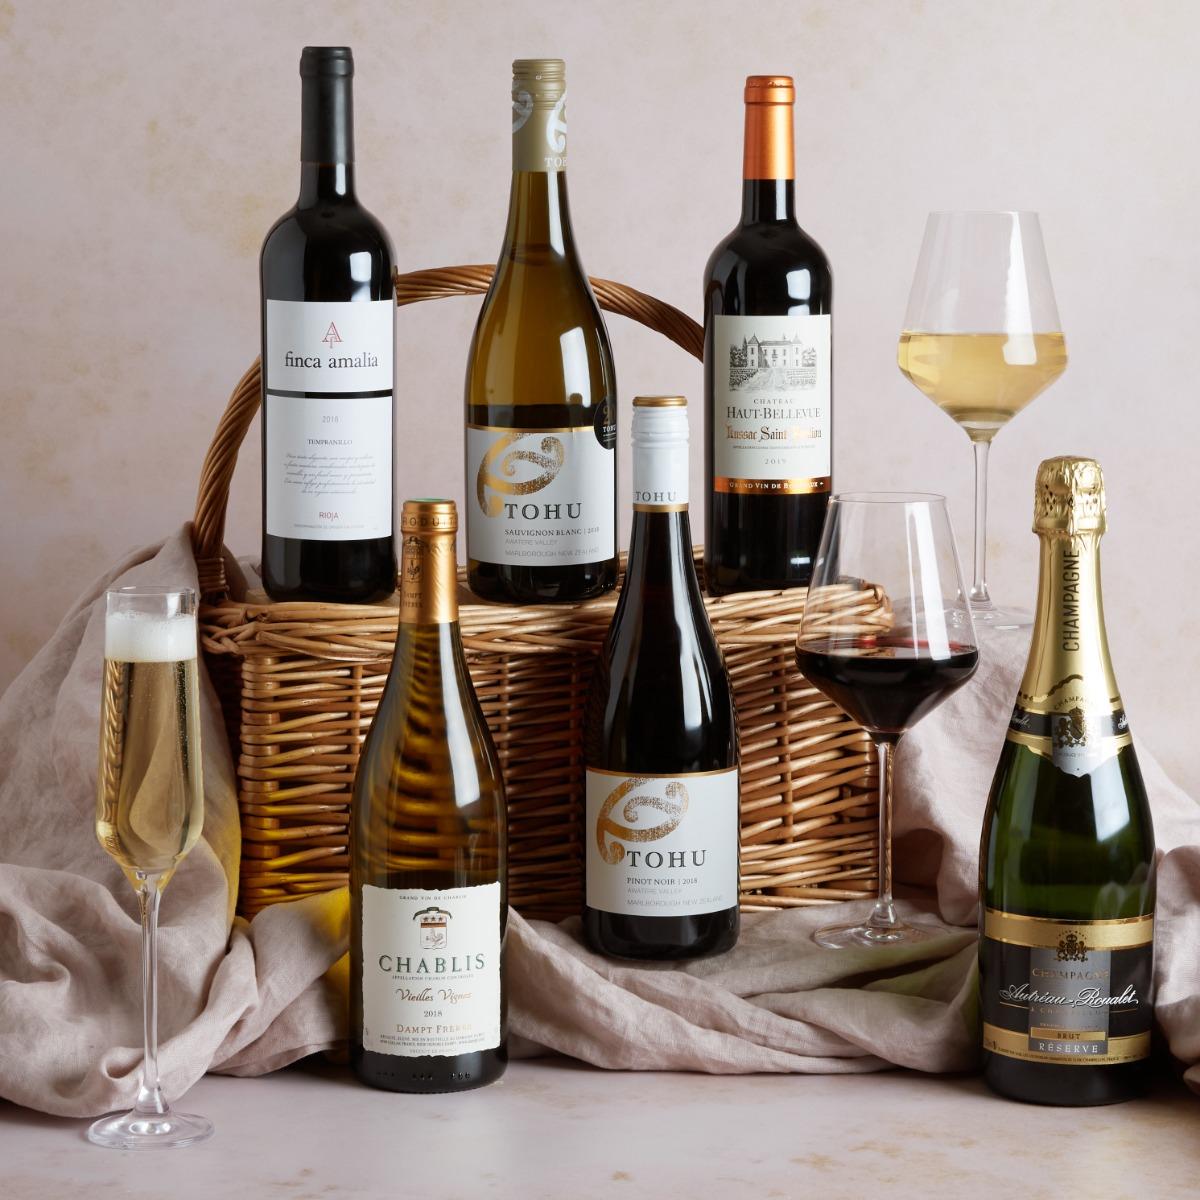 Prestige Six Bottle Wine Selection Wine Hampers UK Hampers.com